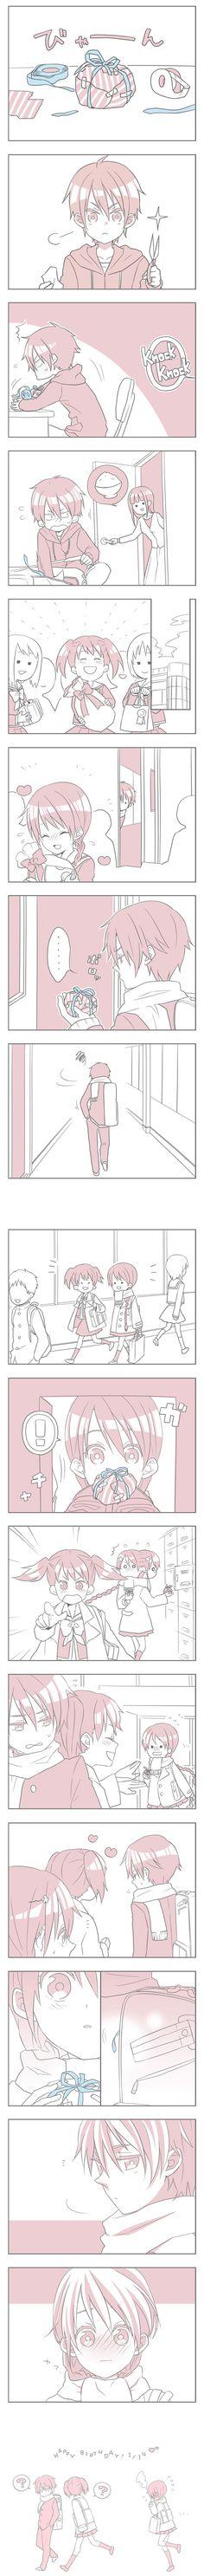 Tennis no Ouji-sama (Prince Of Tennis) - Konomi Takeshi - Image - Zerochan Anime Image Board Anime Couples, Cute Couples, Kawaii, Namaikizakari, Nagisa And Karma, The Prince Of Tennis, Manga Couple, Cute Stories, Art Poses